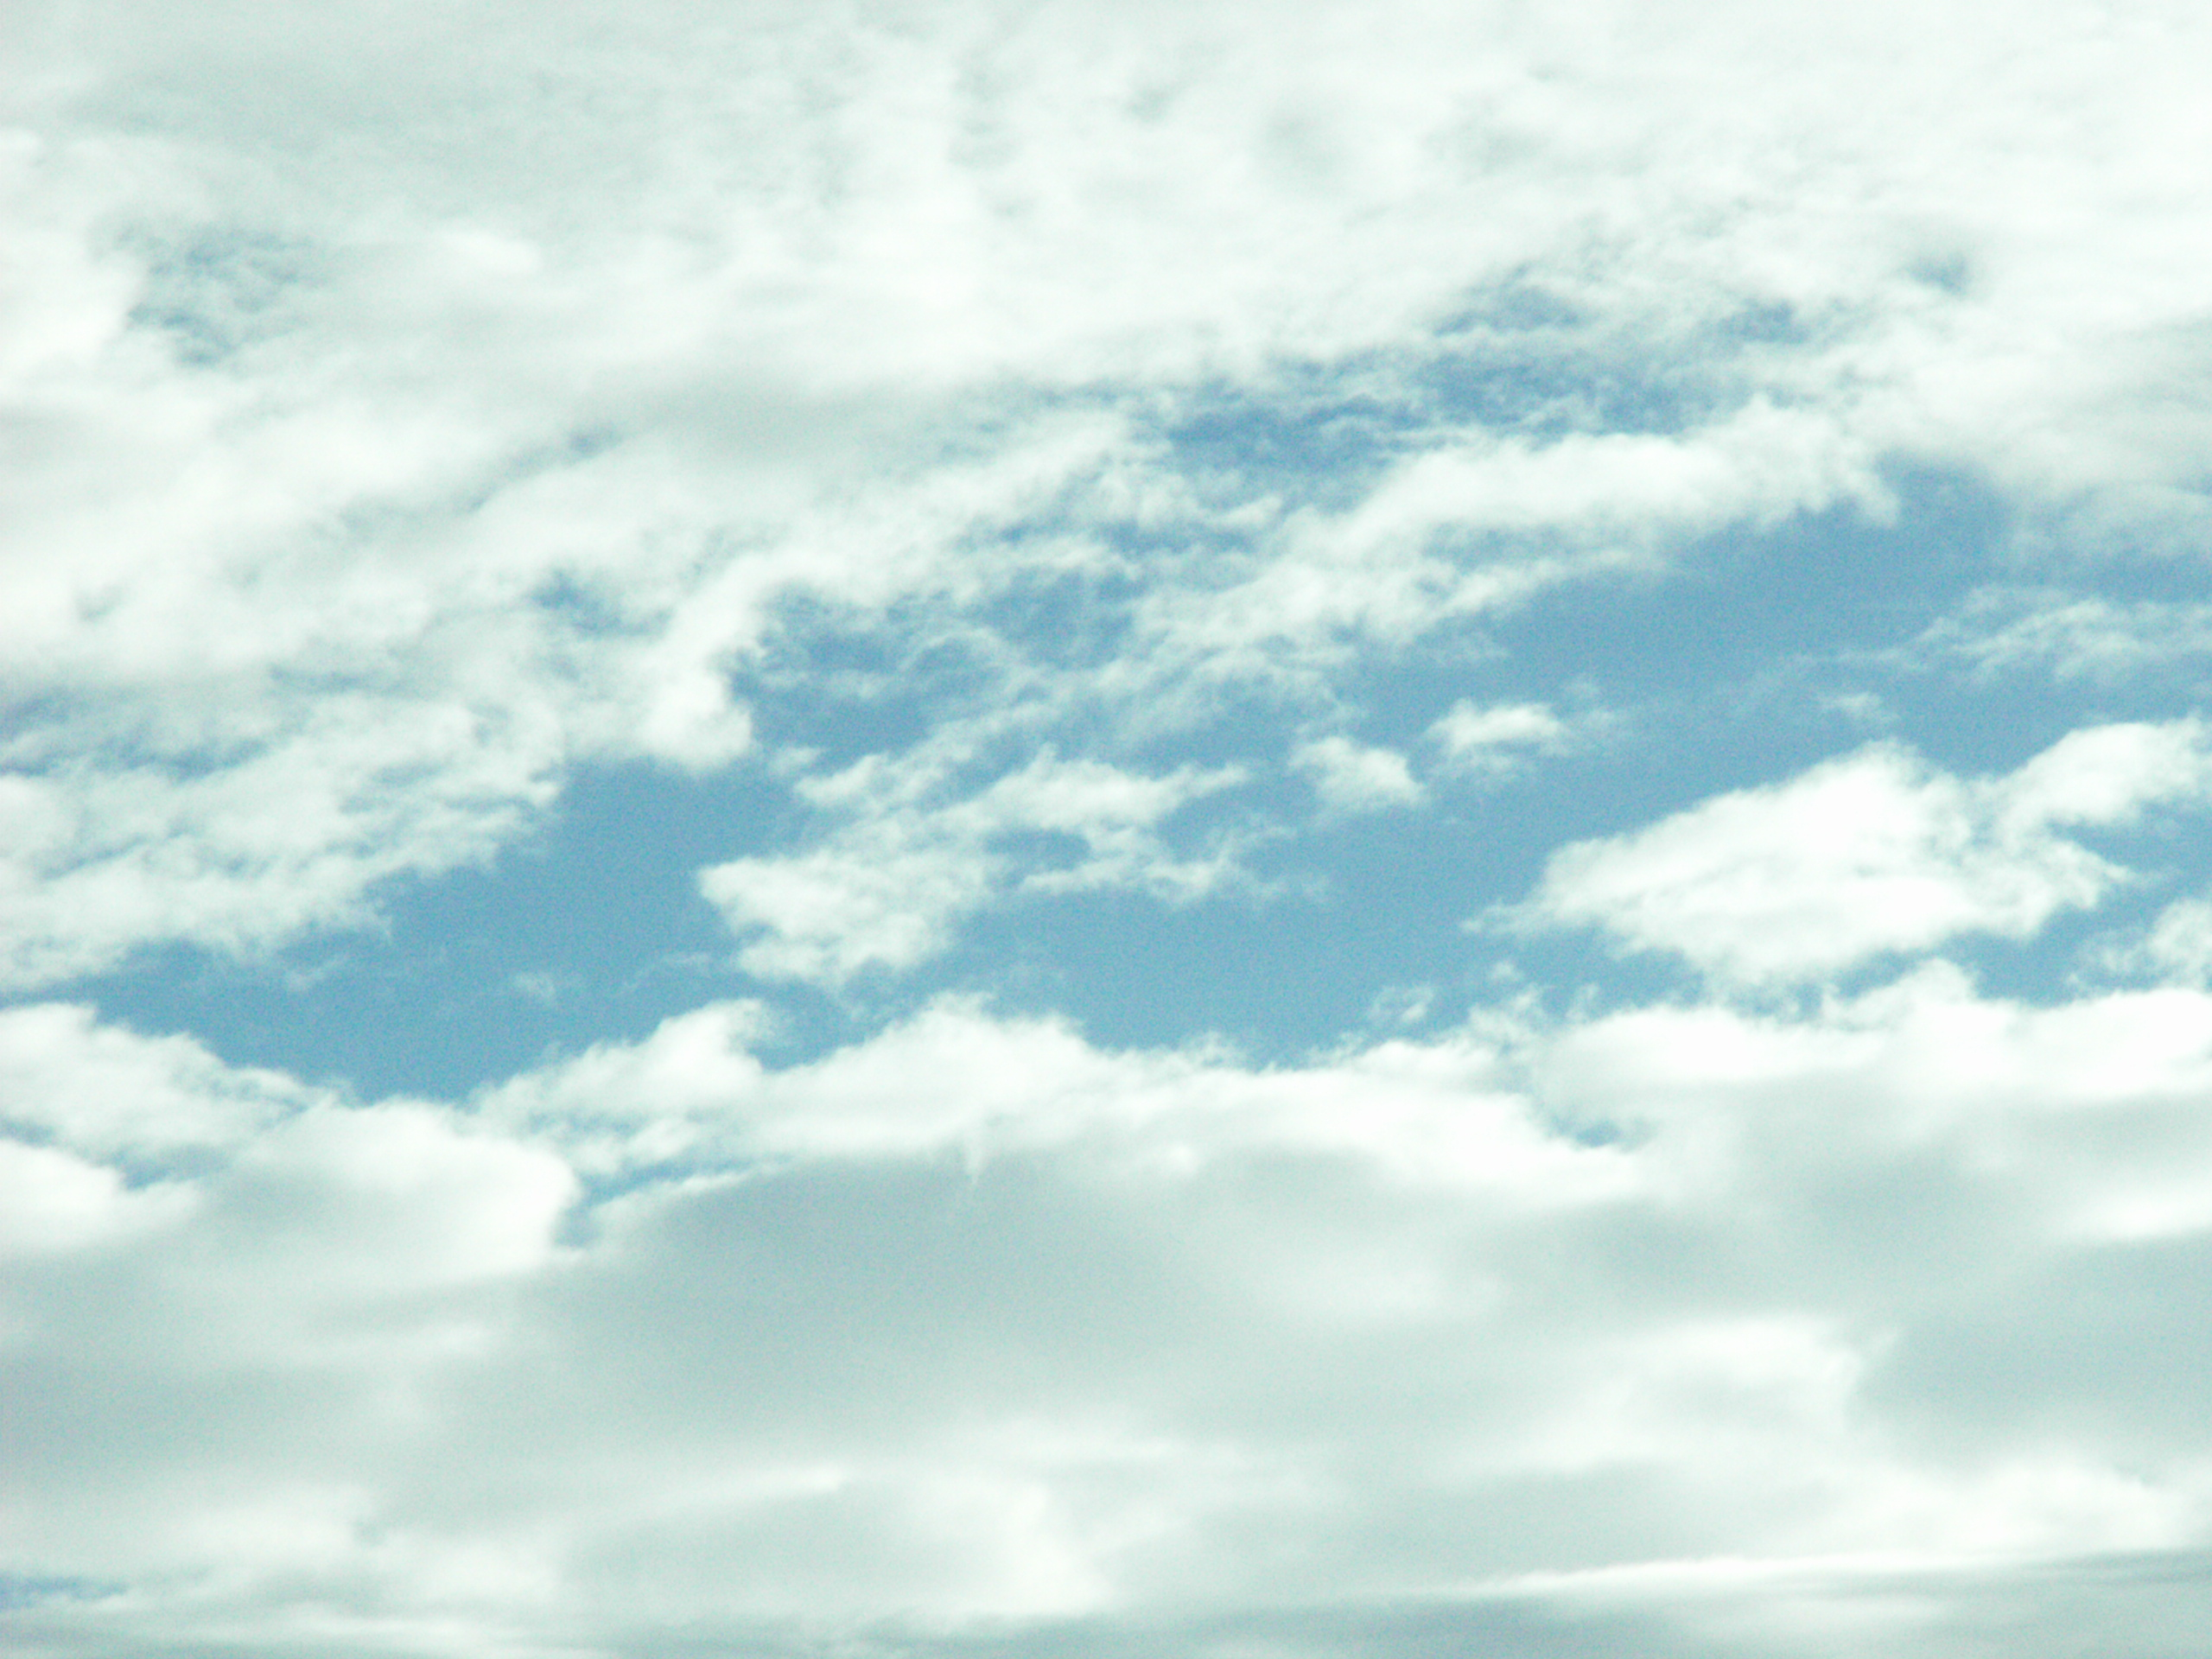 File nuages blanc ciel bleu clair jpg wikimedia commons - Stickers muraux nuages blancs ...